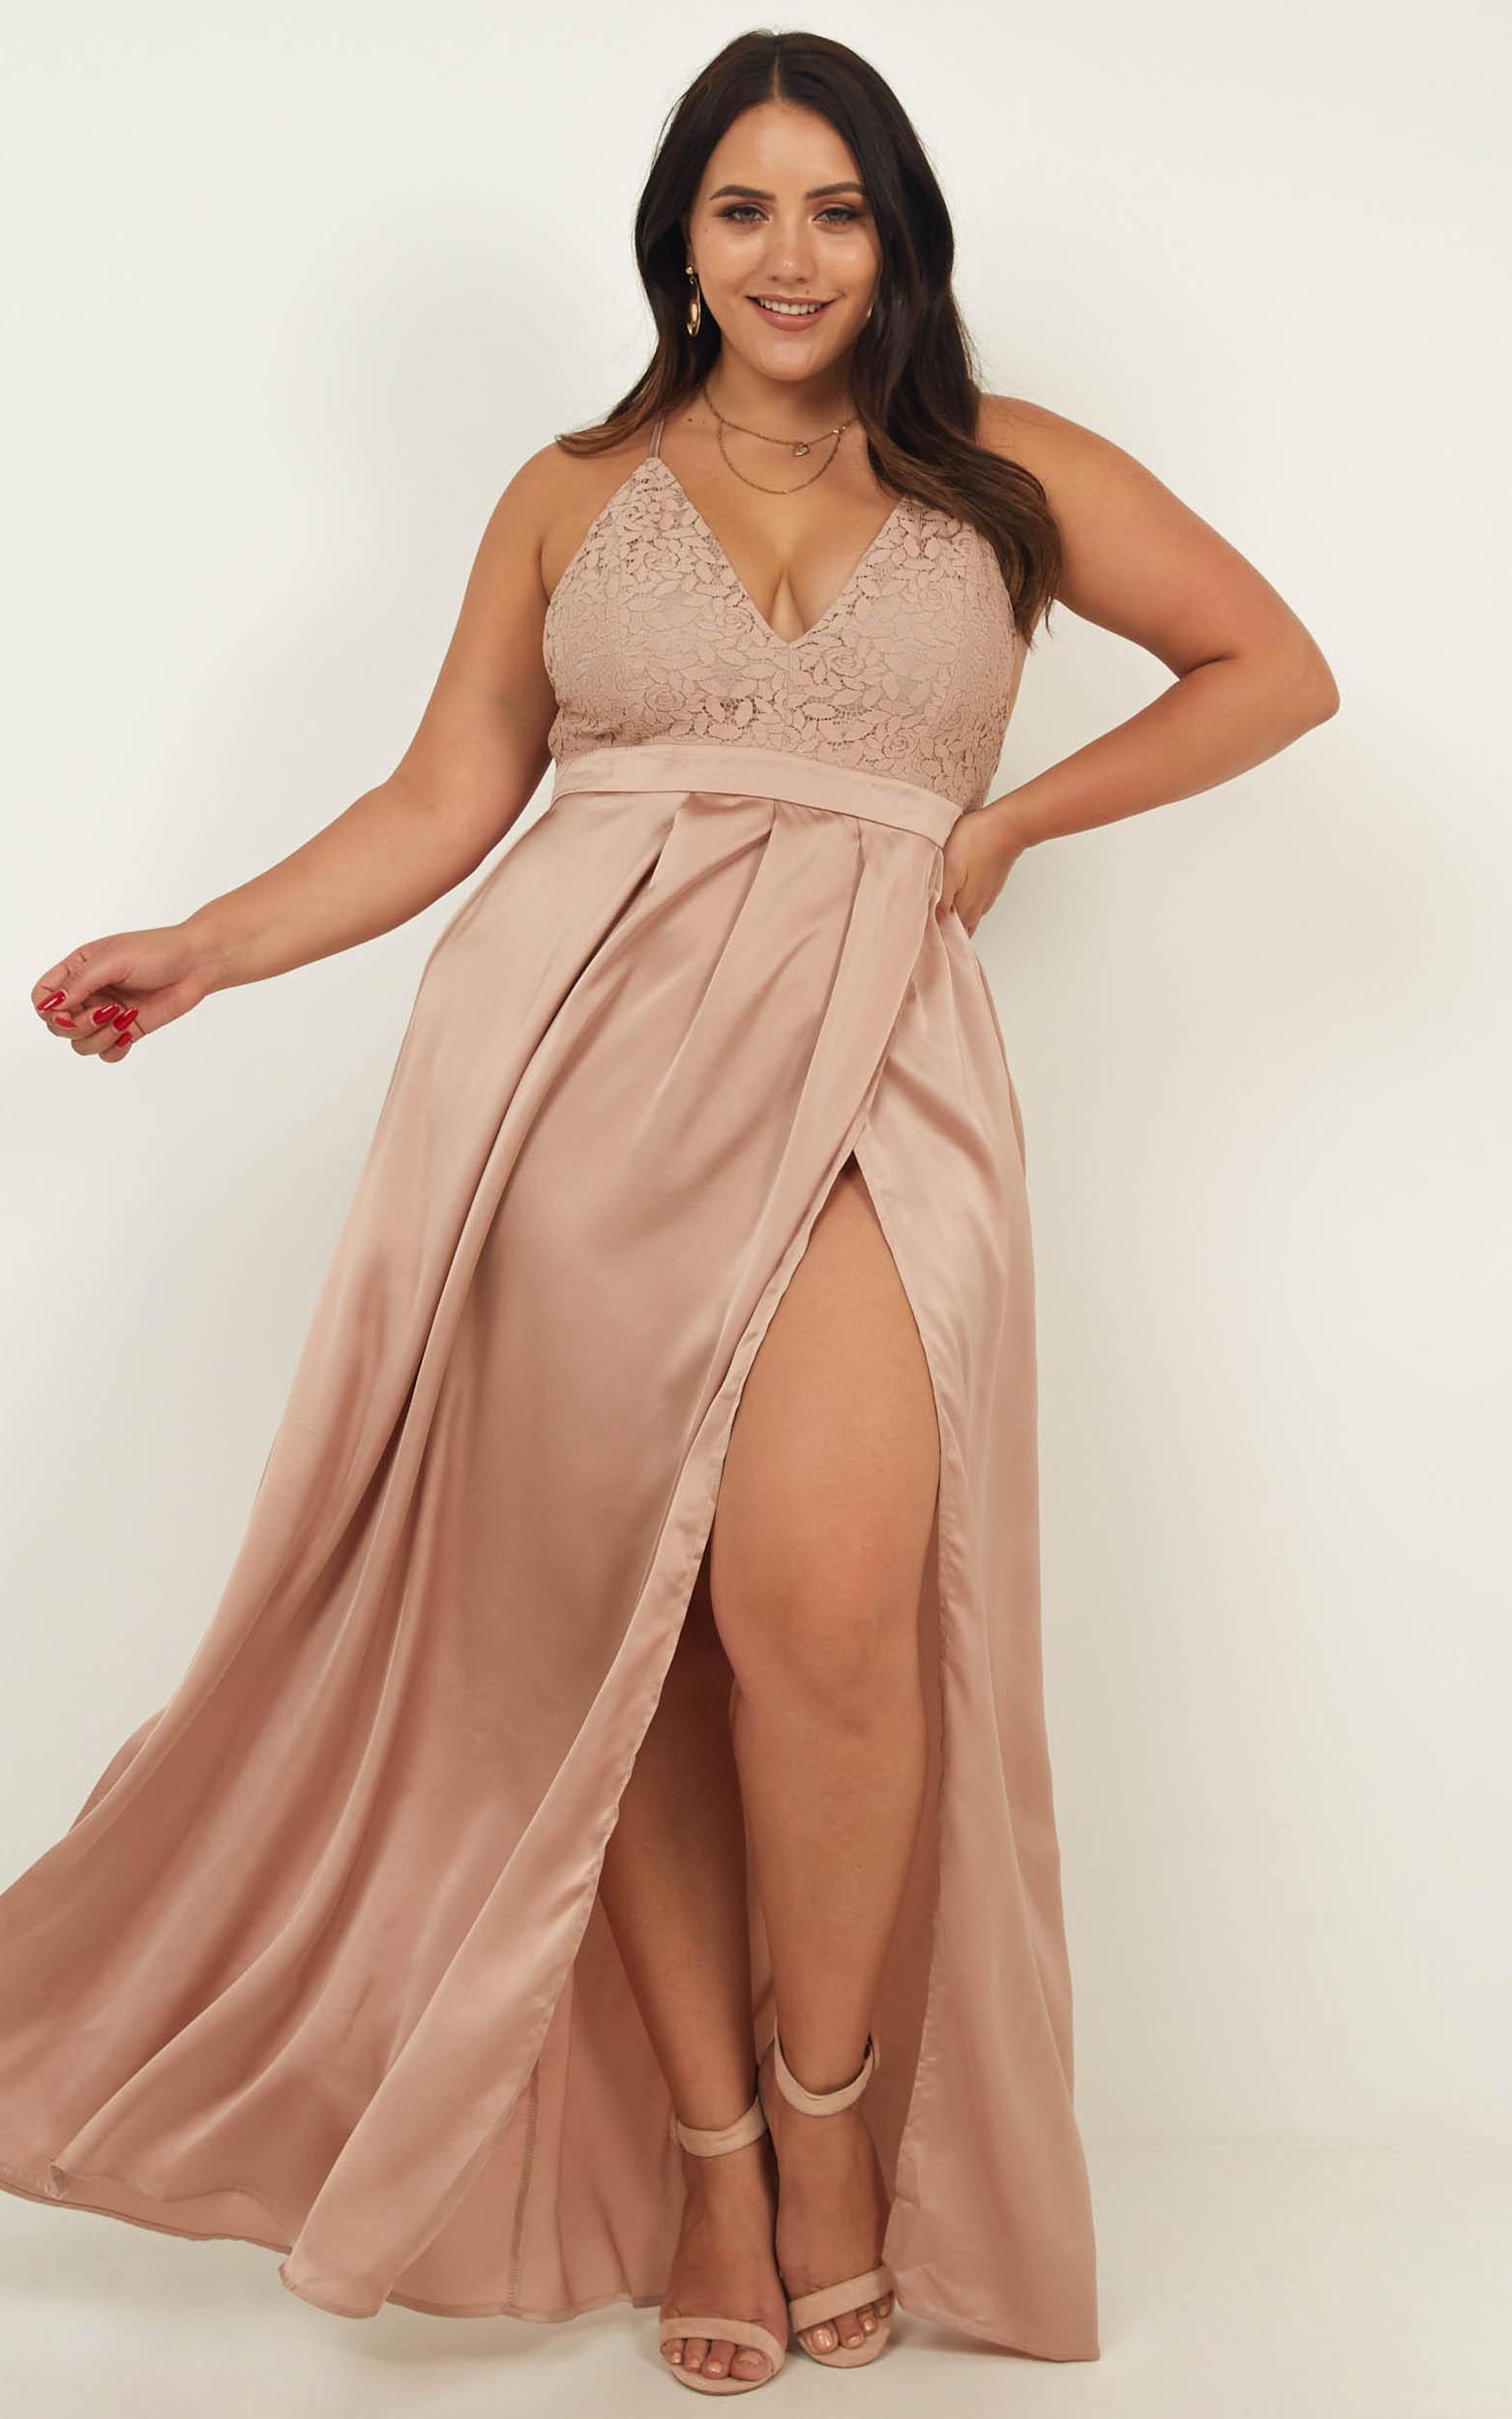 Mocha Satin Dress